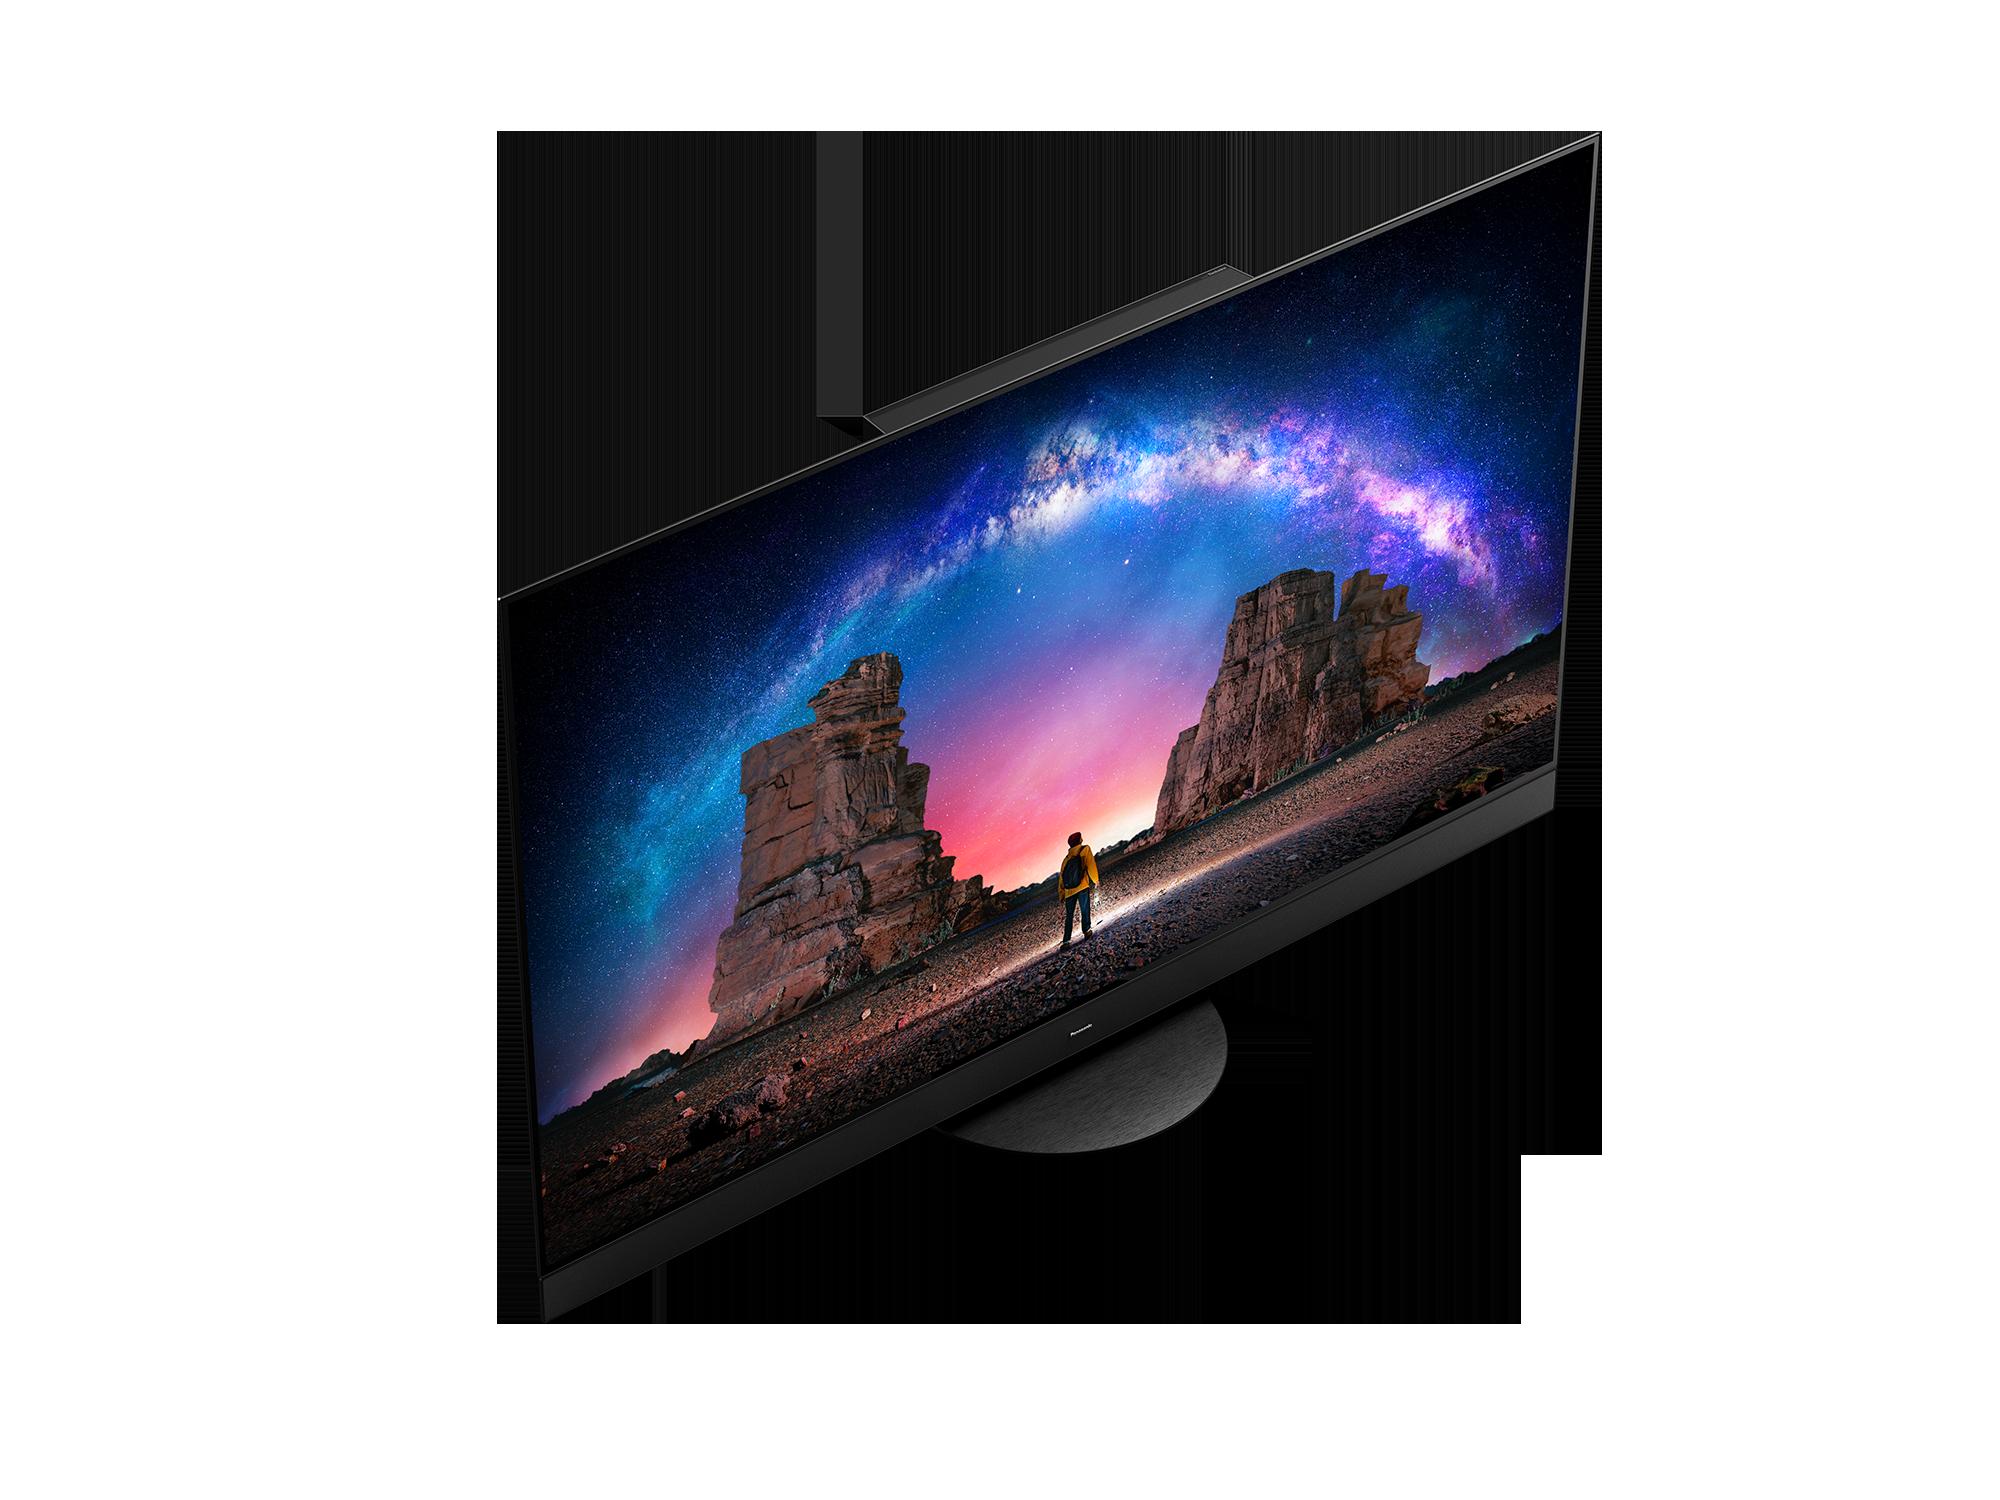 CES 2021: Panasonic представил флагманские OLED-телевизоры 2021 года (TX 65JZ2000E 2000B W2004 C2004 hero B KV)